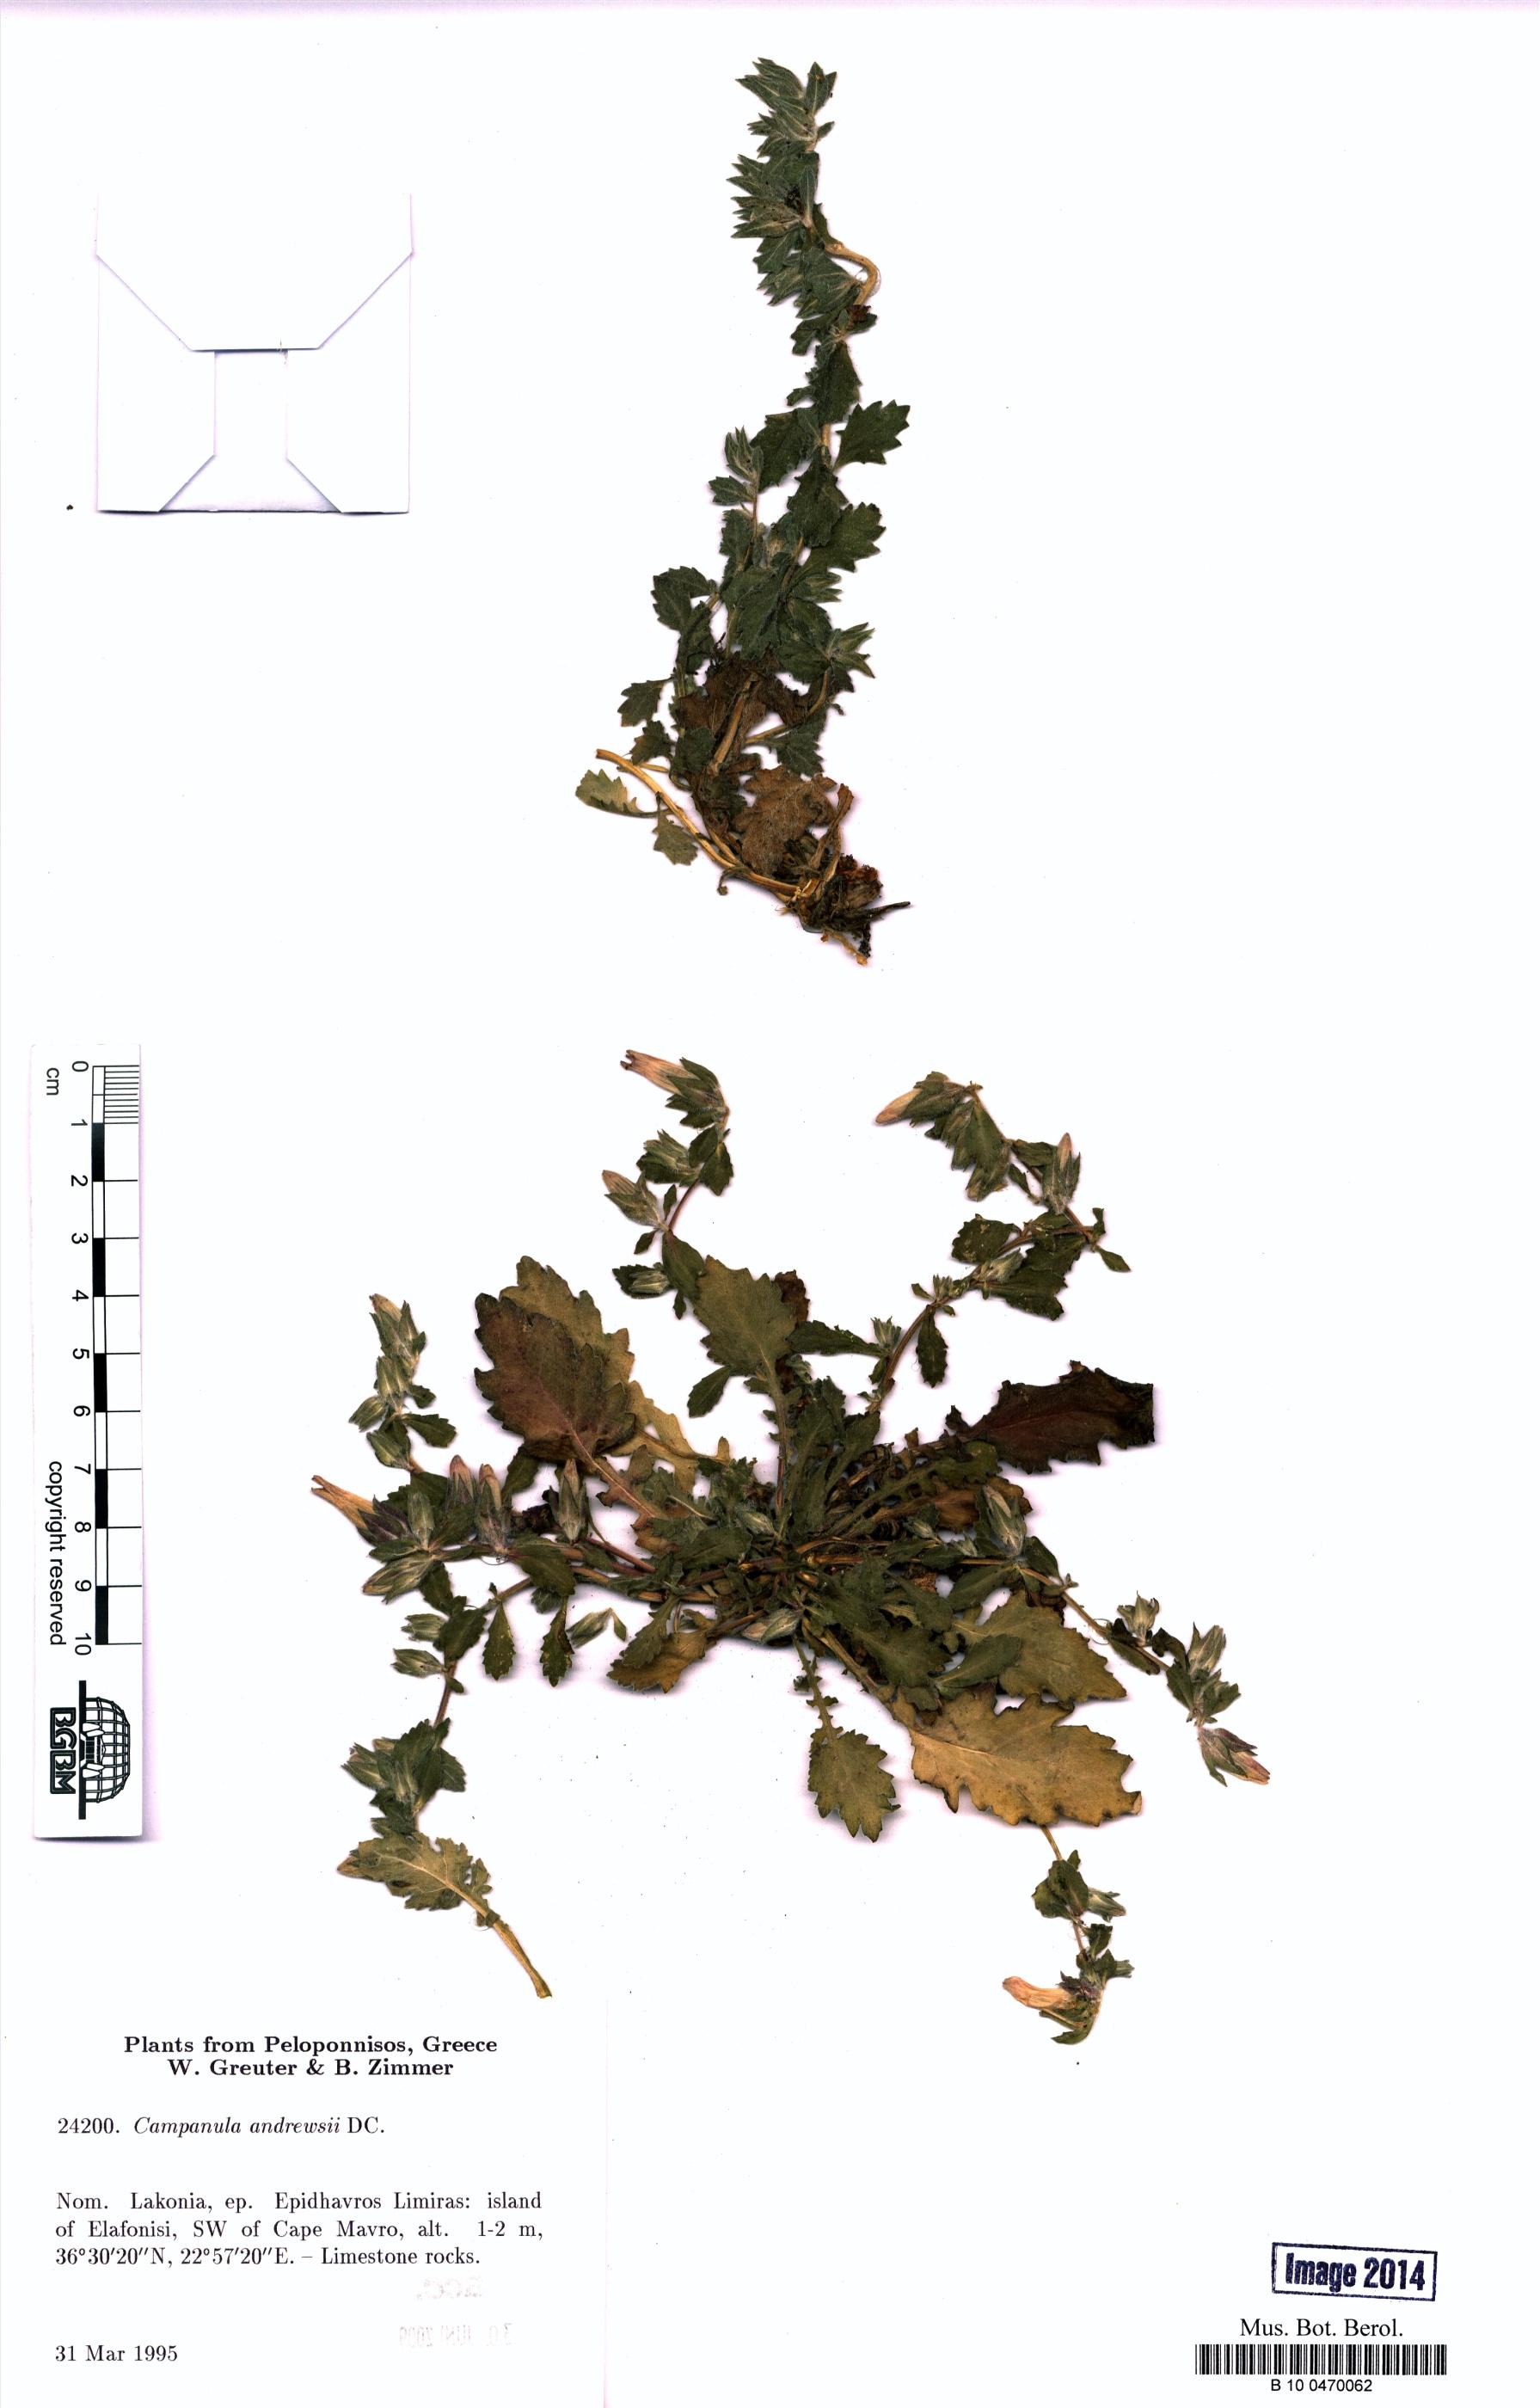 http://ww2.bgbm.org/herbarium/images/B/10/04/70/06/B_10_0470062.jpg